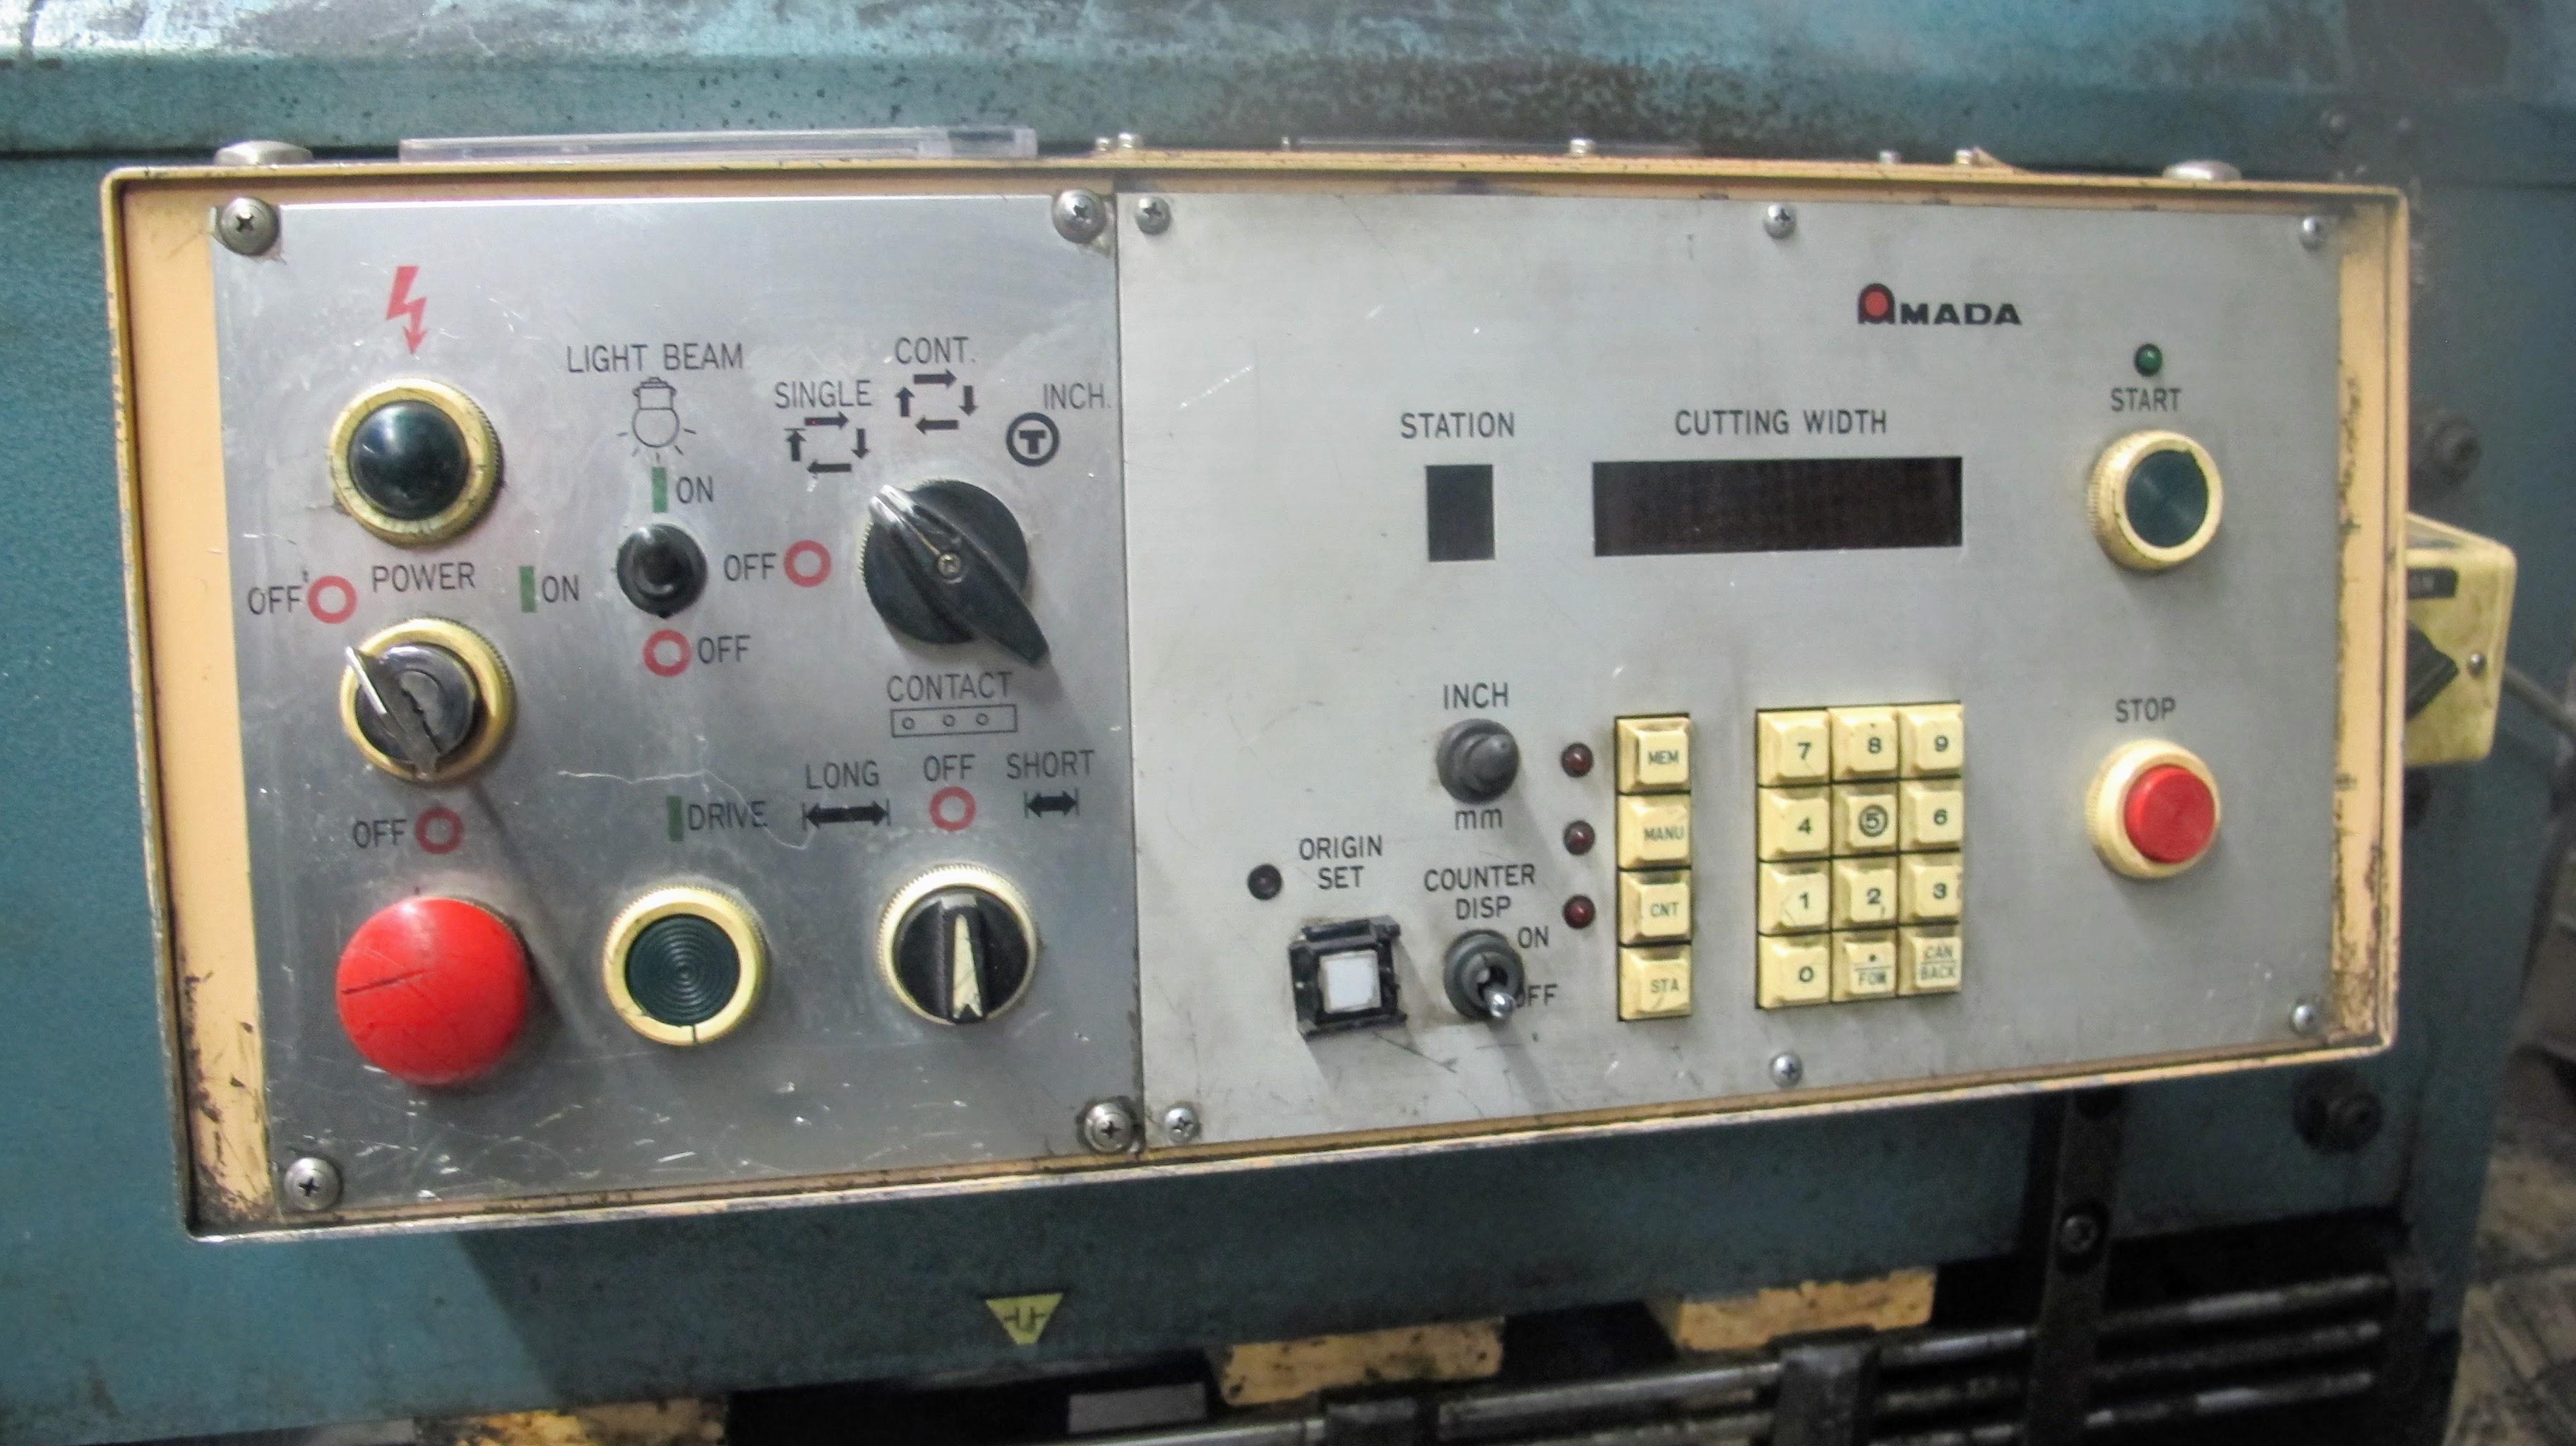 "AMADA M-2545 POWER SHEAR, 3/16"" X 96"" CAP., 60 SPM, S/N 2502496, 3 PHASE, 5.9KVA FULL LOAD - Image 4 of 7"